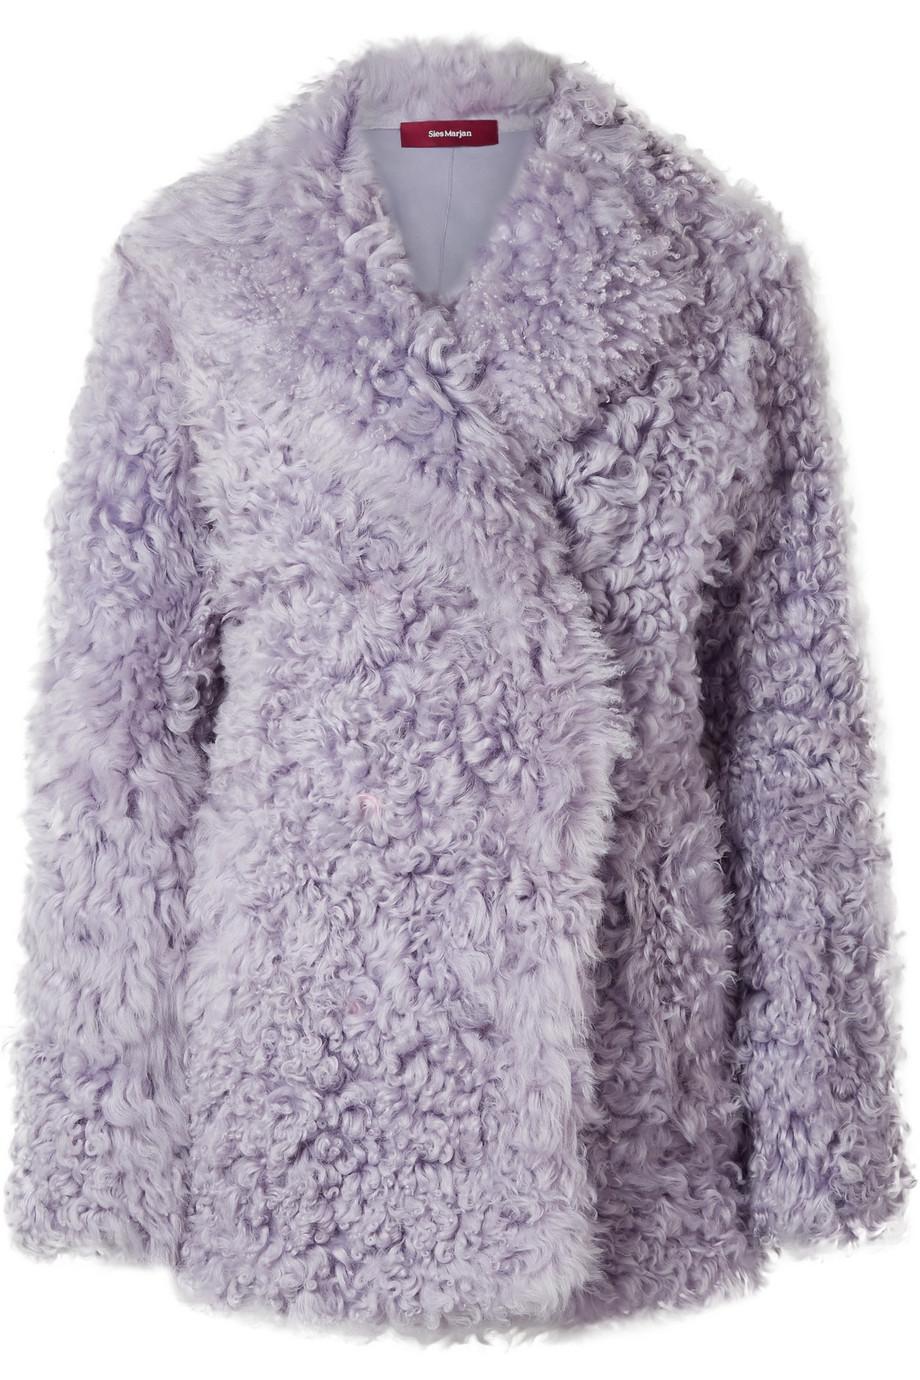 SIES MARJAN Pippa shearling coat, £2,195